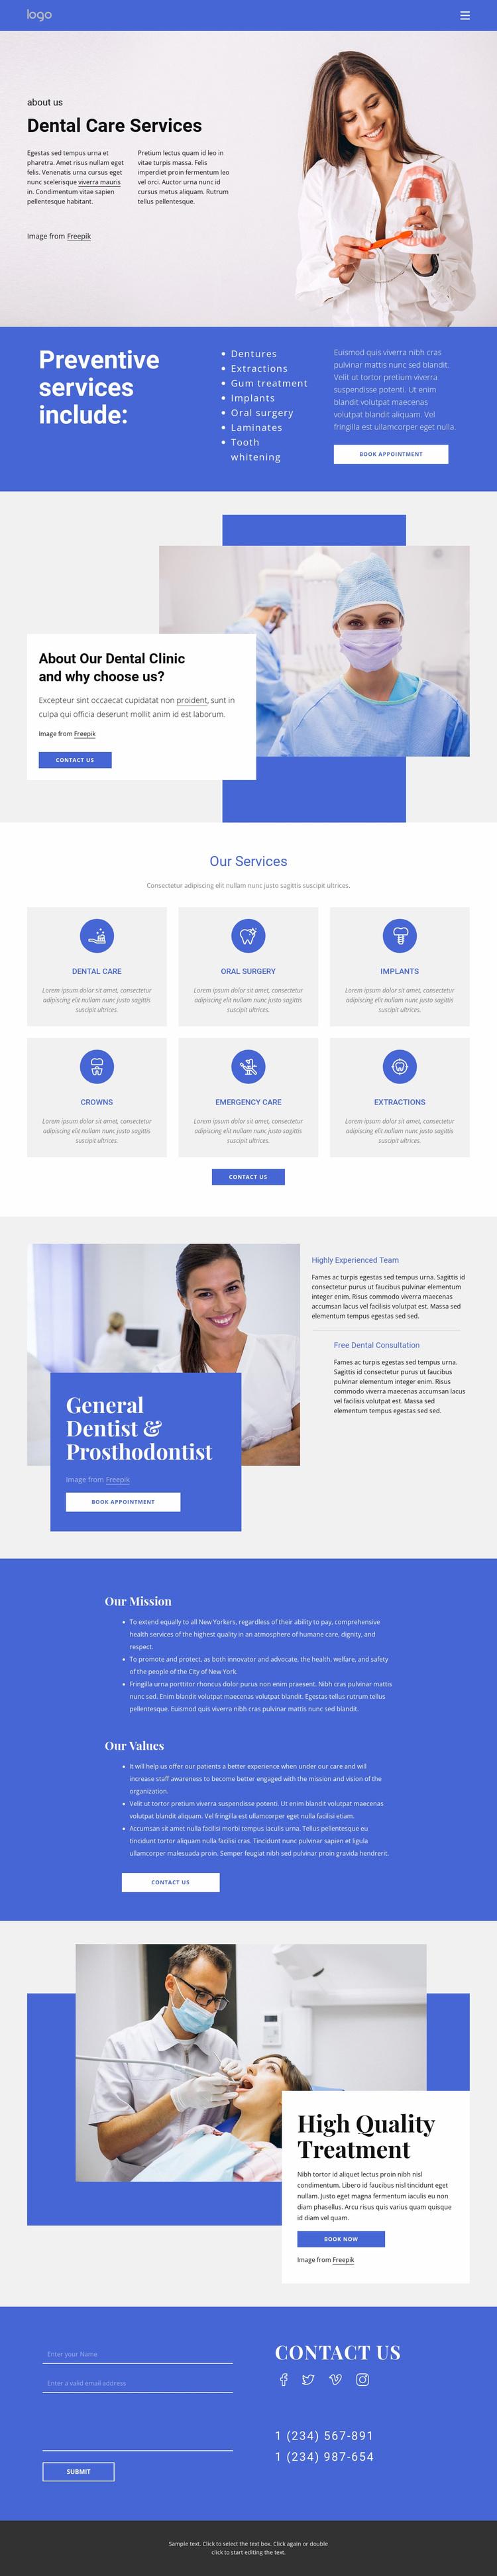 Dentist and prosthodontics Website Design